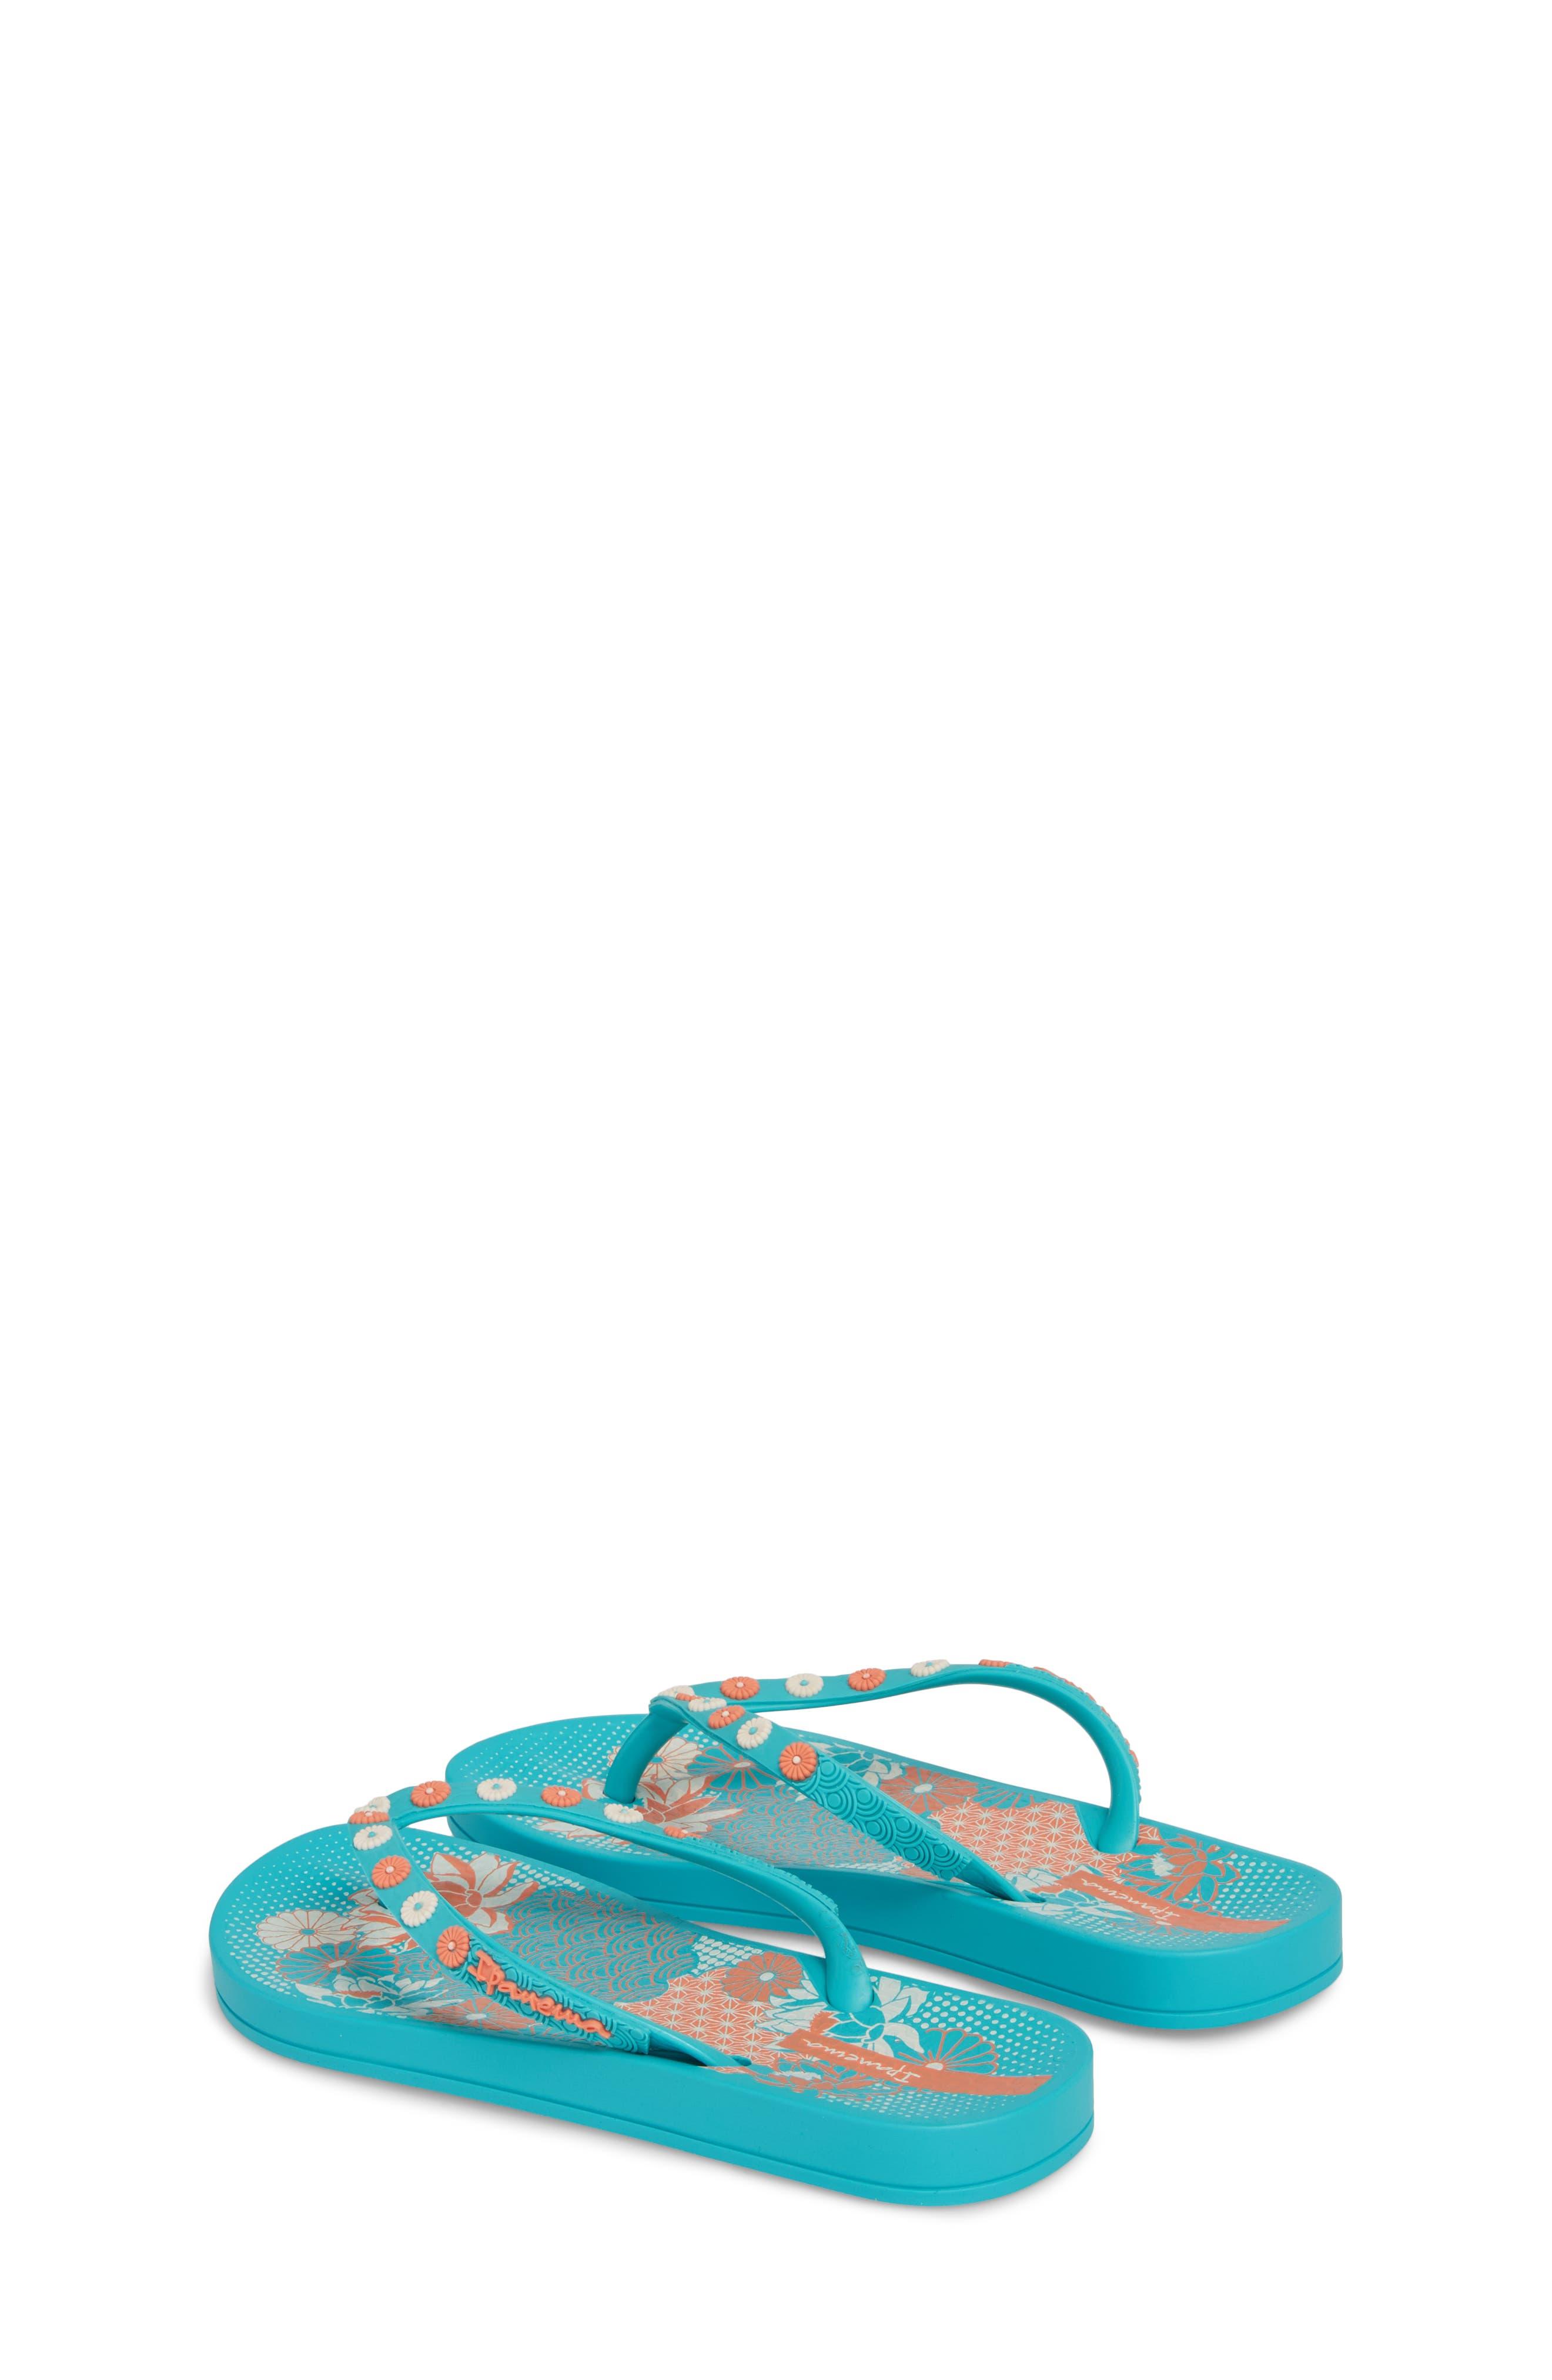 Ana Lovely Flip Flop,                             Alternate thumbnail 2, color,                             Blue